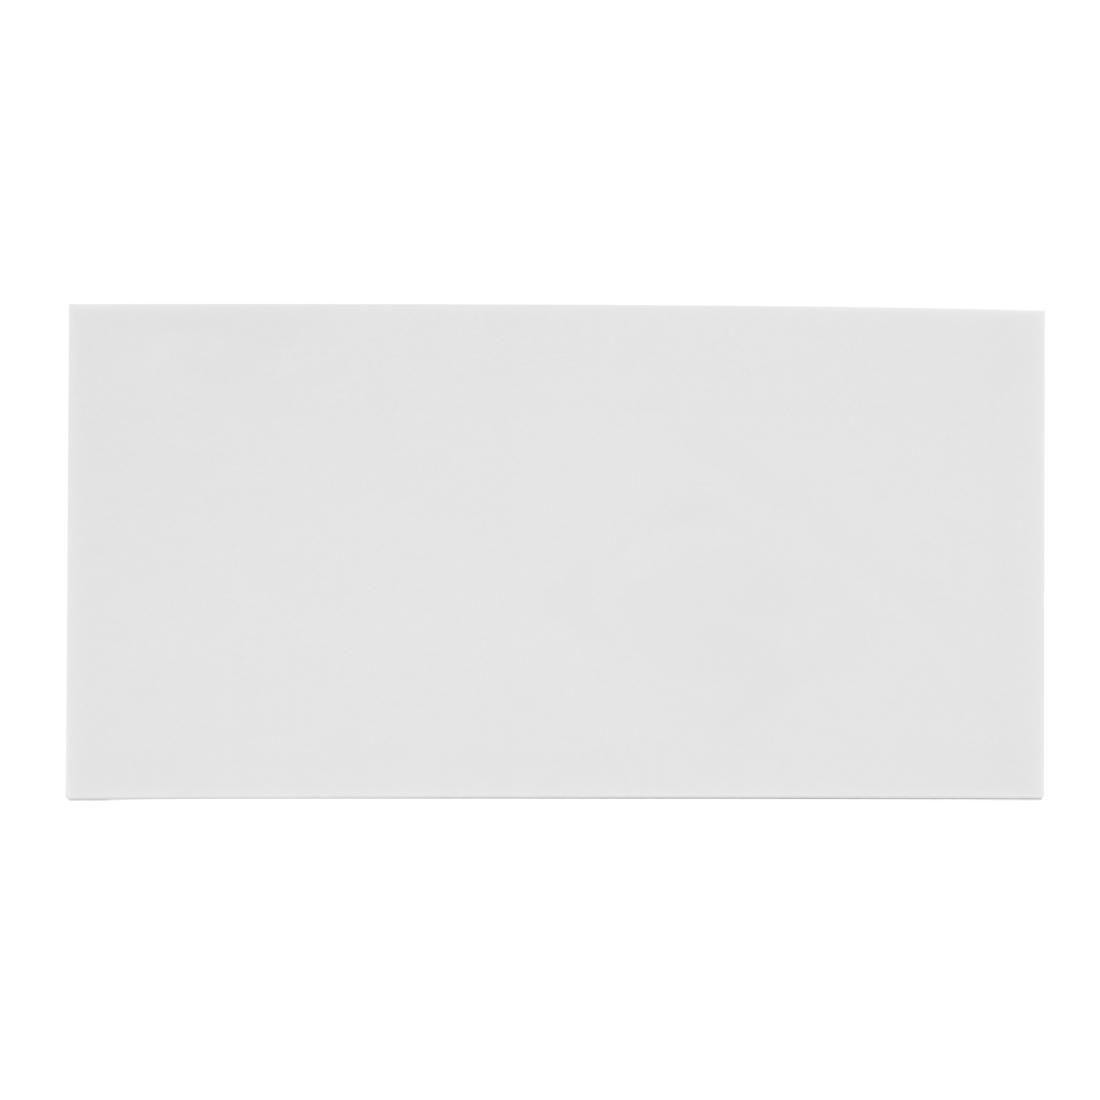 White Plastic Acrylic Cut Plexiglass Sheet A3 Size 297mm x 420mm x 2mm